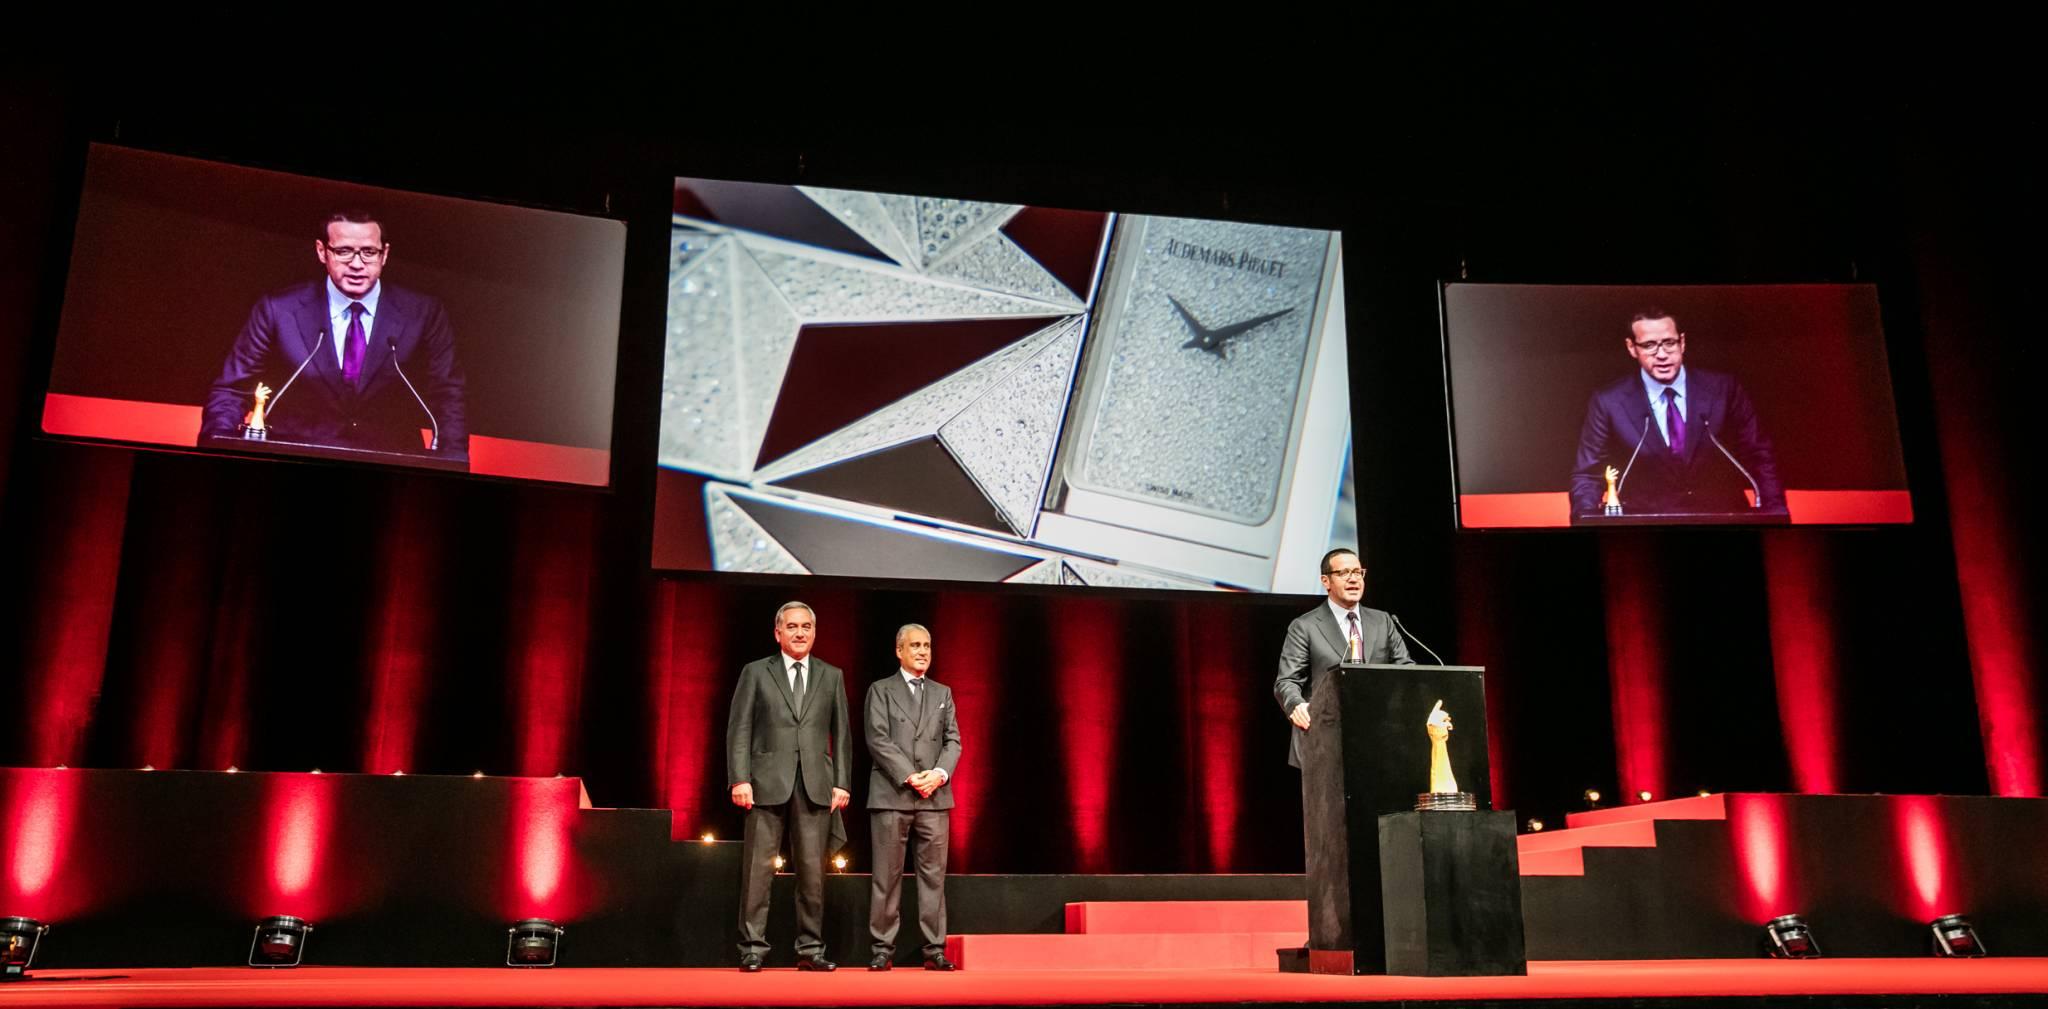 François Bennahmias (CEO of Audemars Piguet, winner of the Jewellery Watch Prize 2015) with Claude Sfeir and Abdul Hamied Seddiqi (jury members)